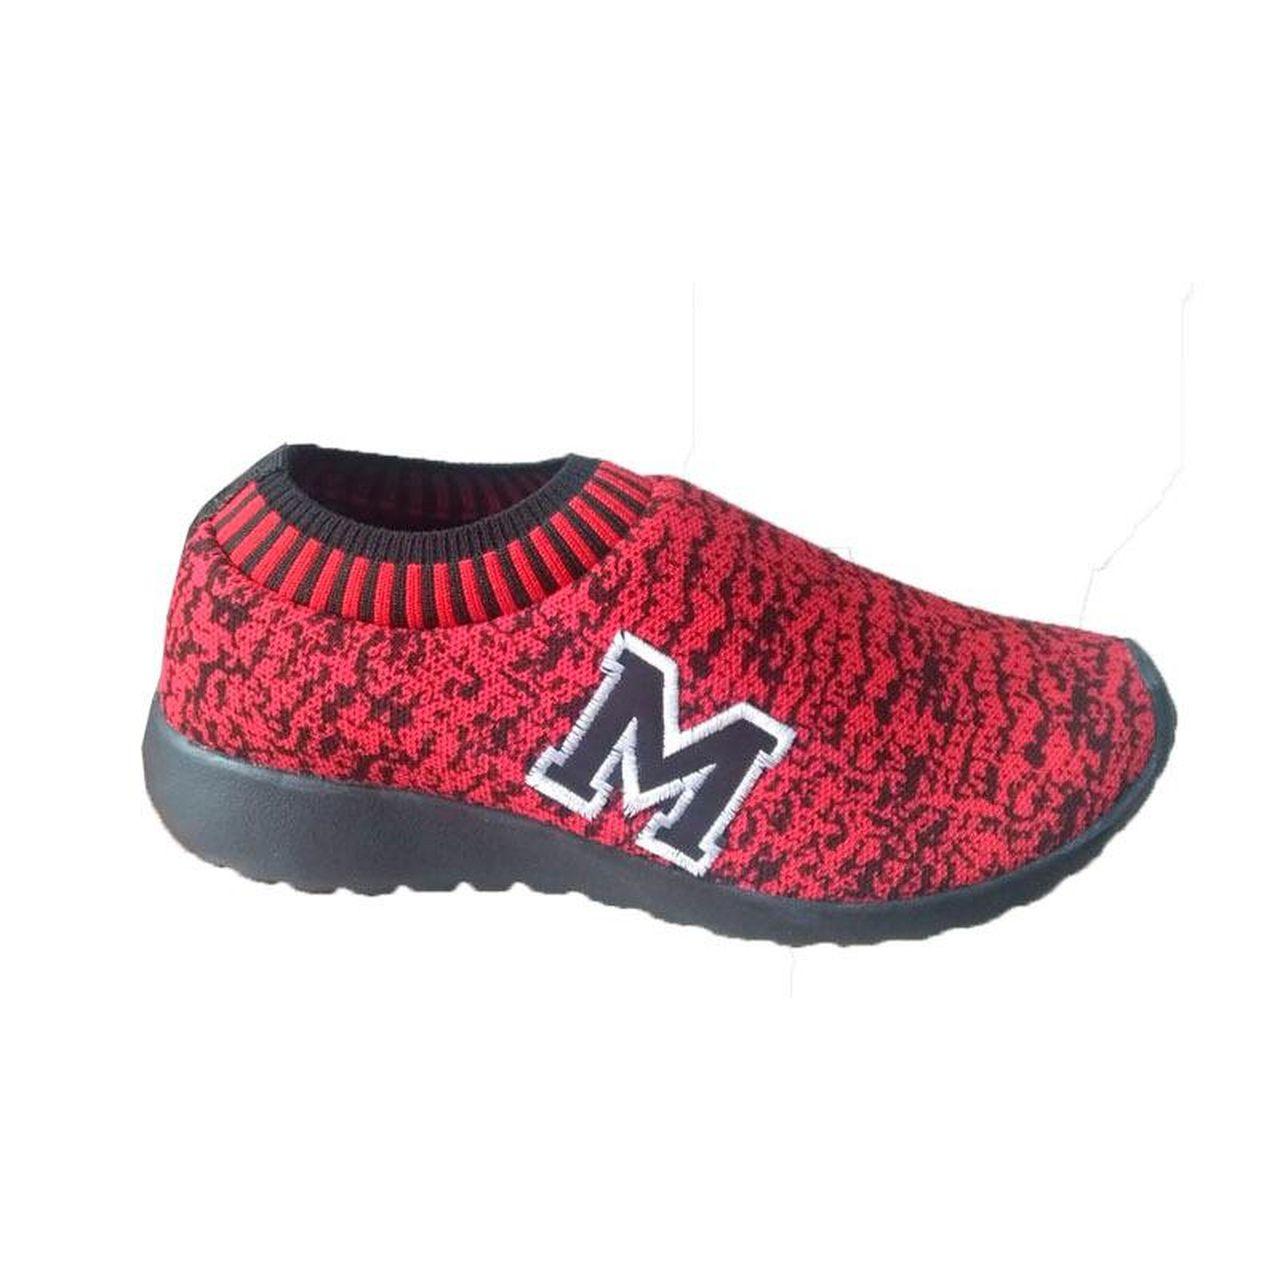 Tenis Marathon Confort Anfibio Neoprene Vermelho/Preto